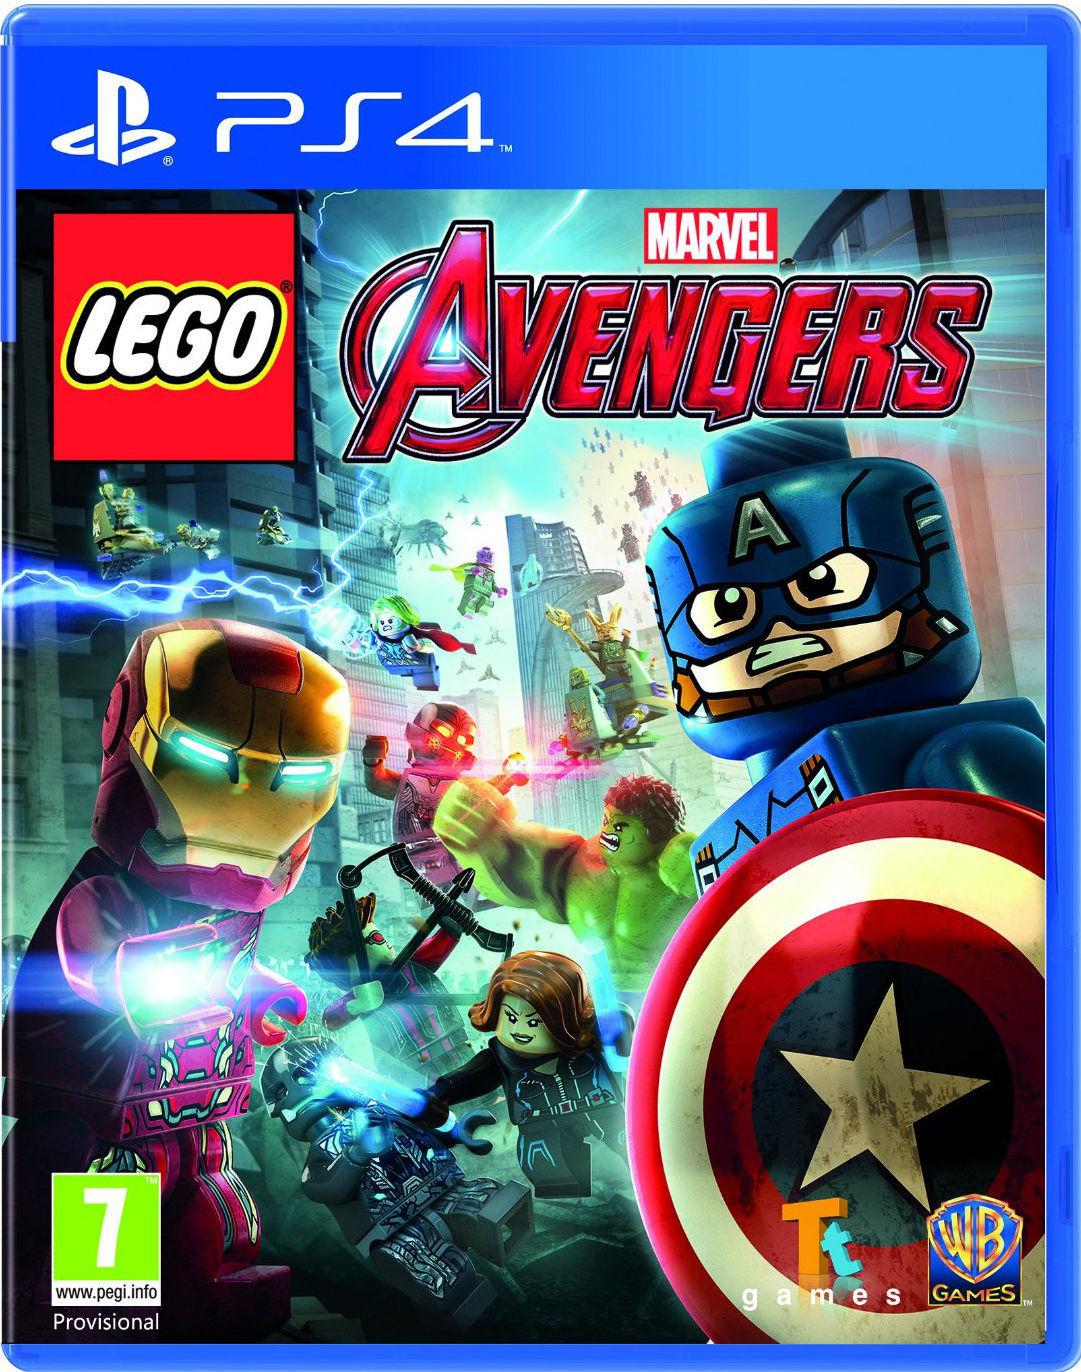 Lego Marvel Vengadores Toda La Informacion Ps4 Pc Ps3 Xbox 360